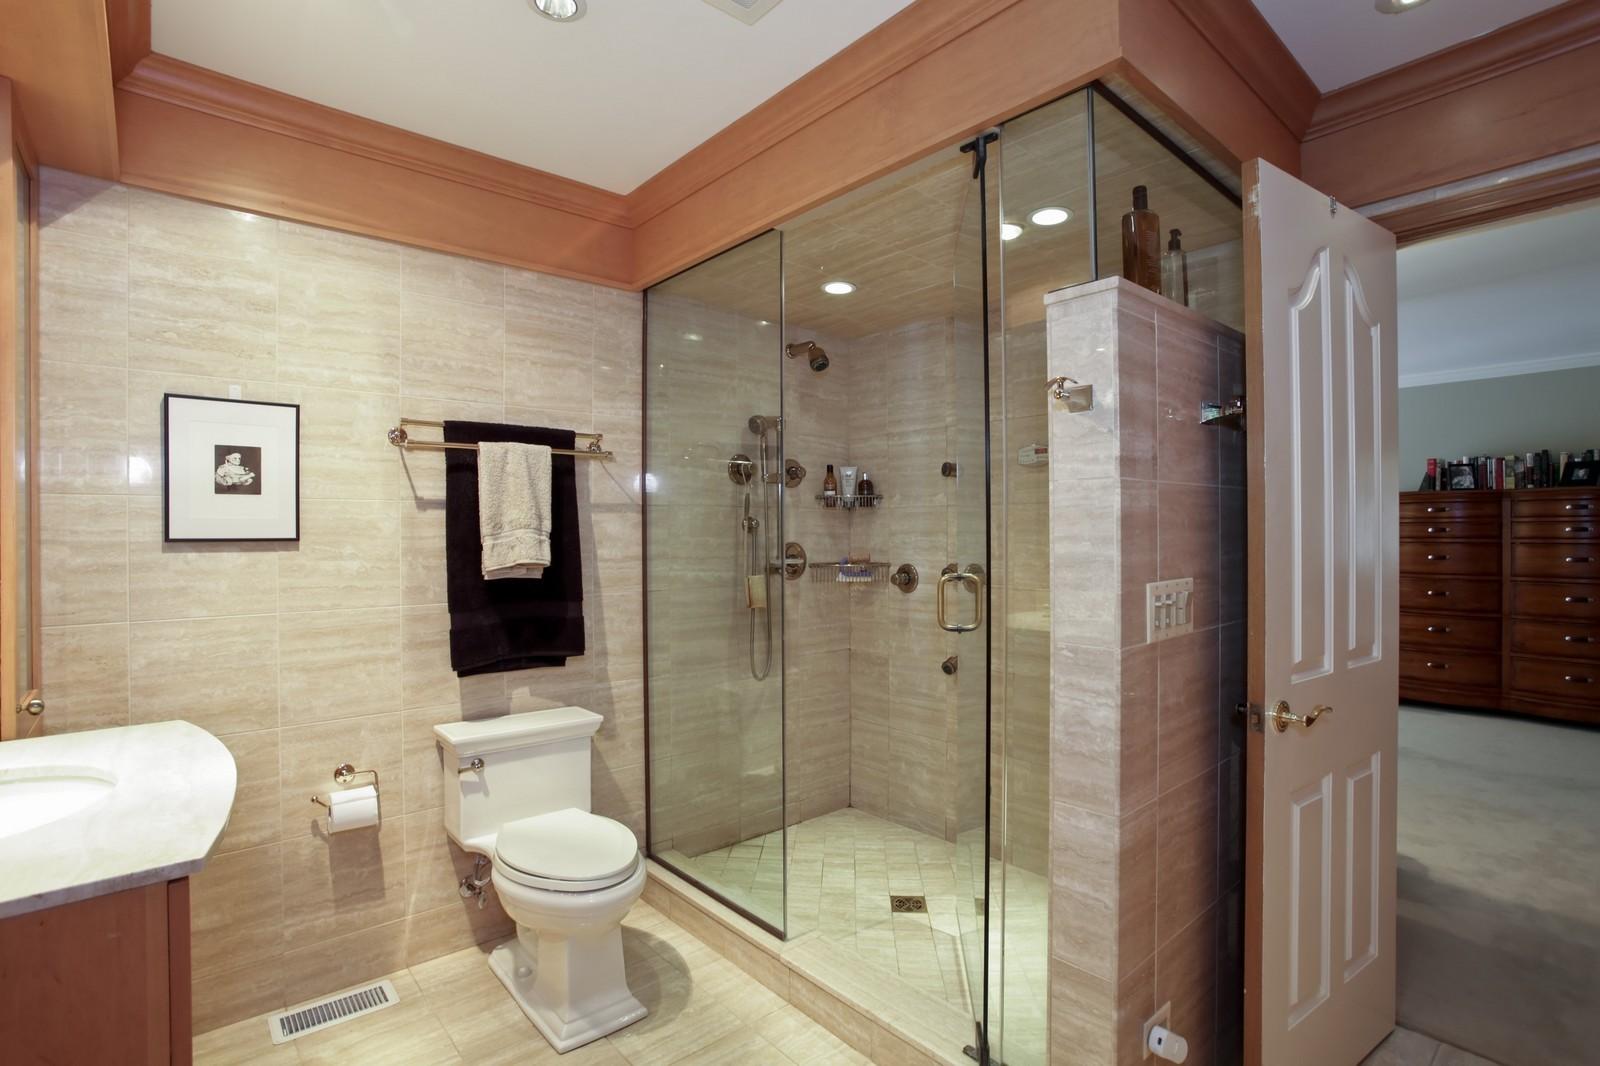 Real Estate Photography - 25W445 Plamondon Rd, Wheaton, IL, 60189 - Master Bath - His